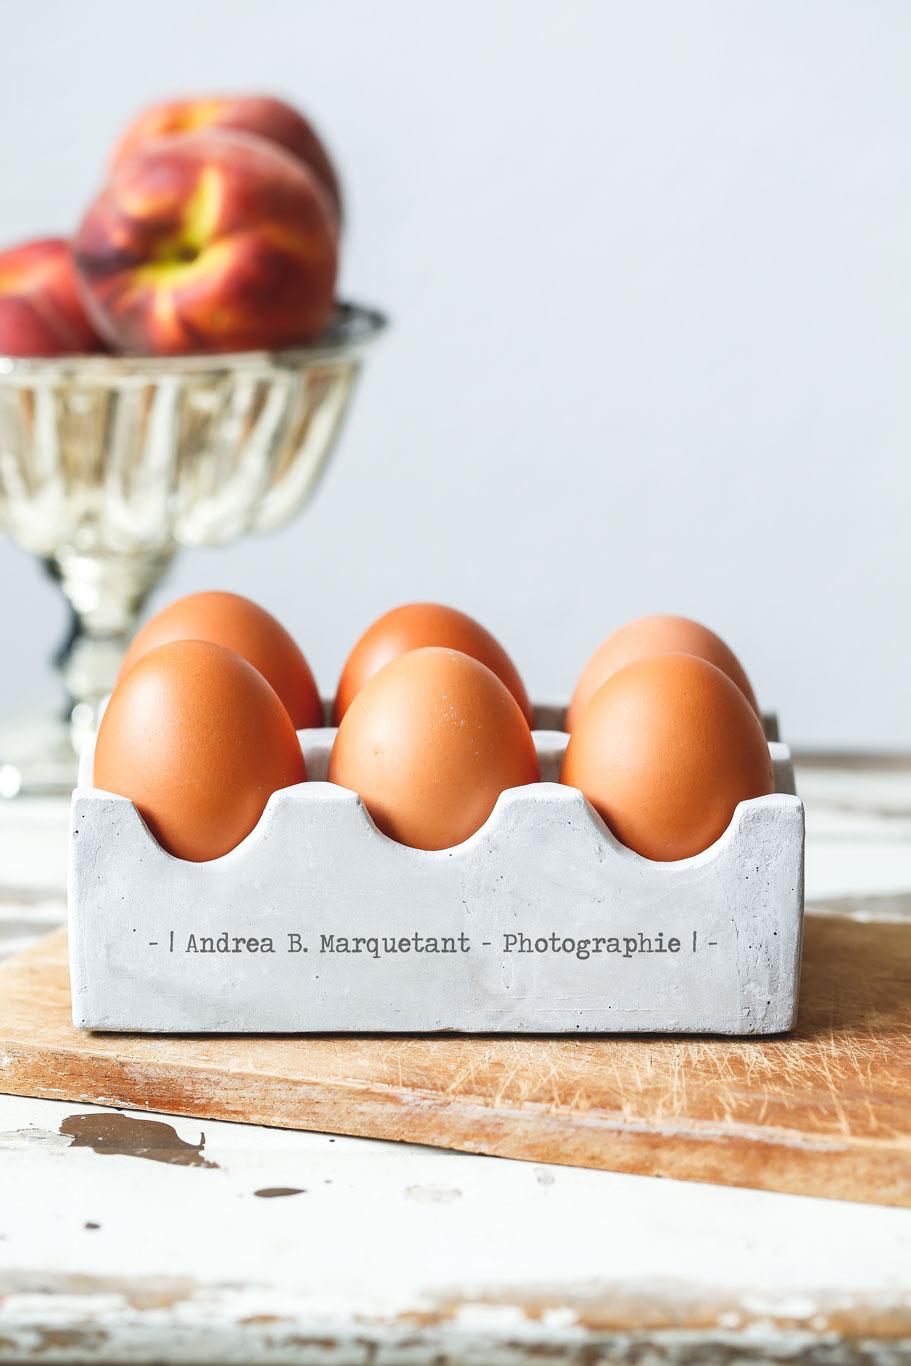 Fotografie - Tipps & Tricks - Food2Shoot - cover